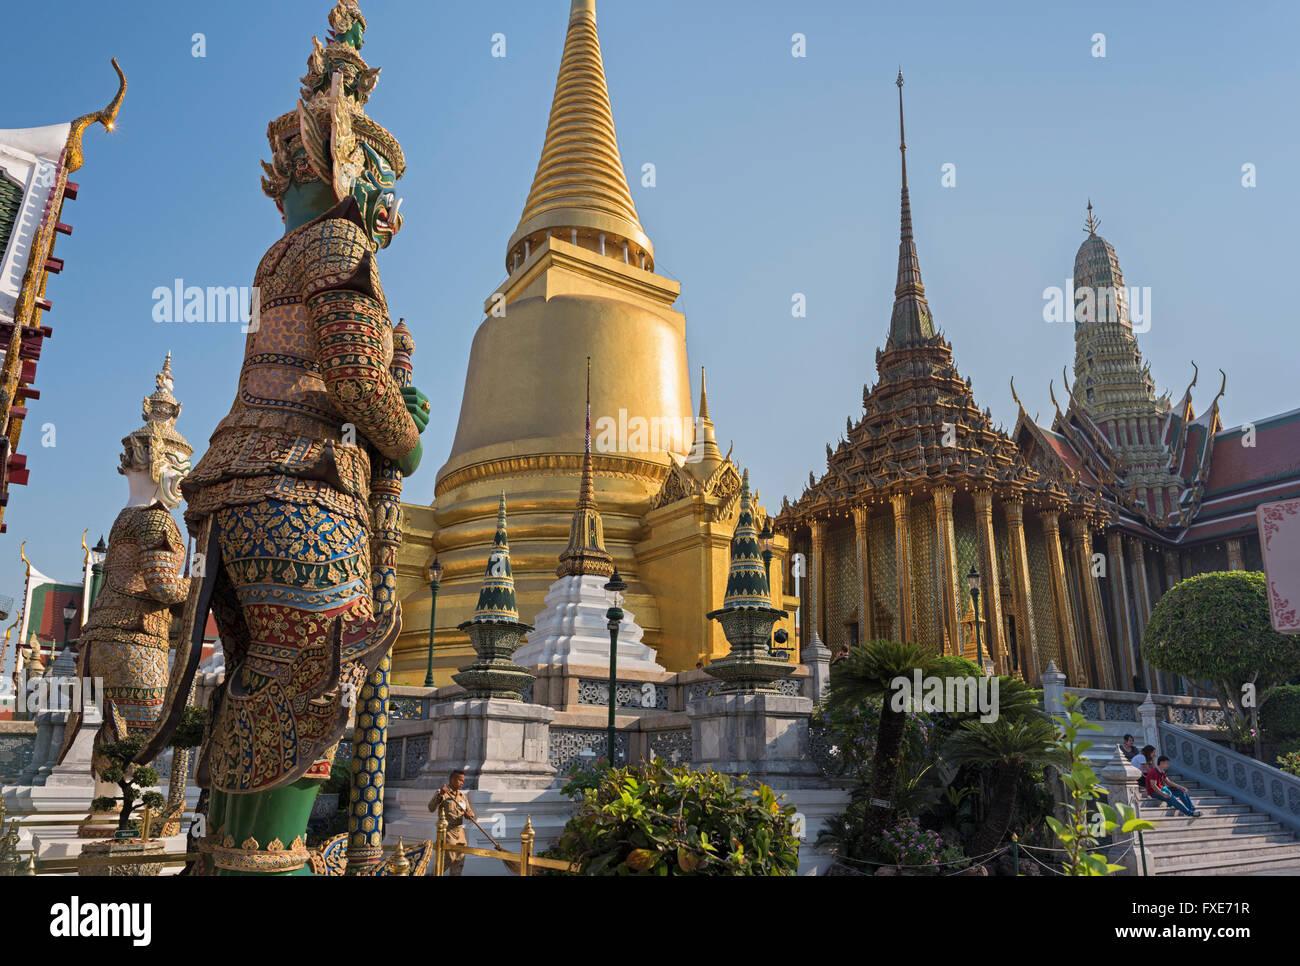 Wat Phra Kaew Grand Palace Bangkok Thailand Stockbild